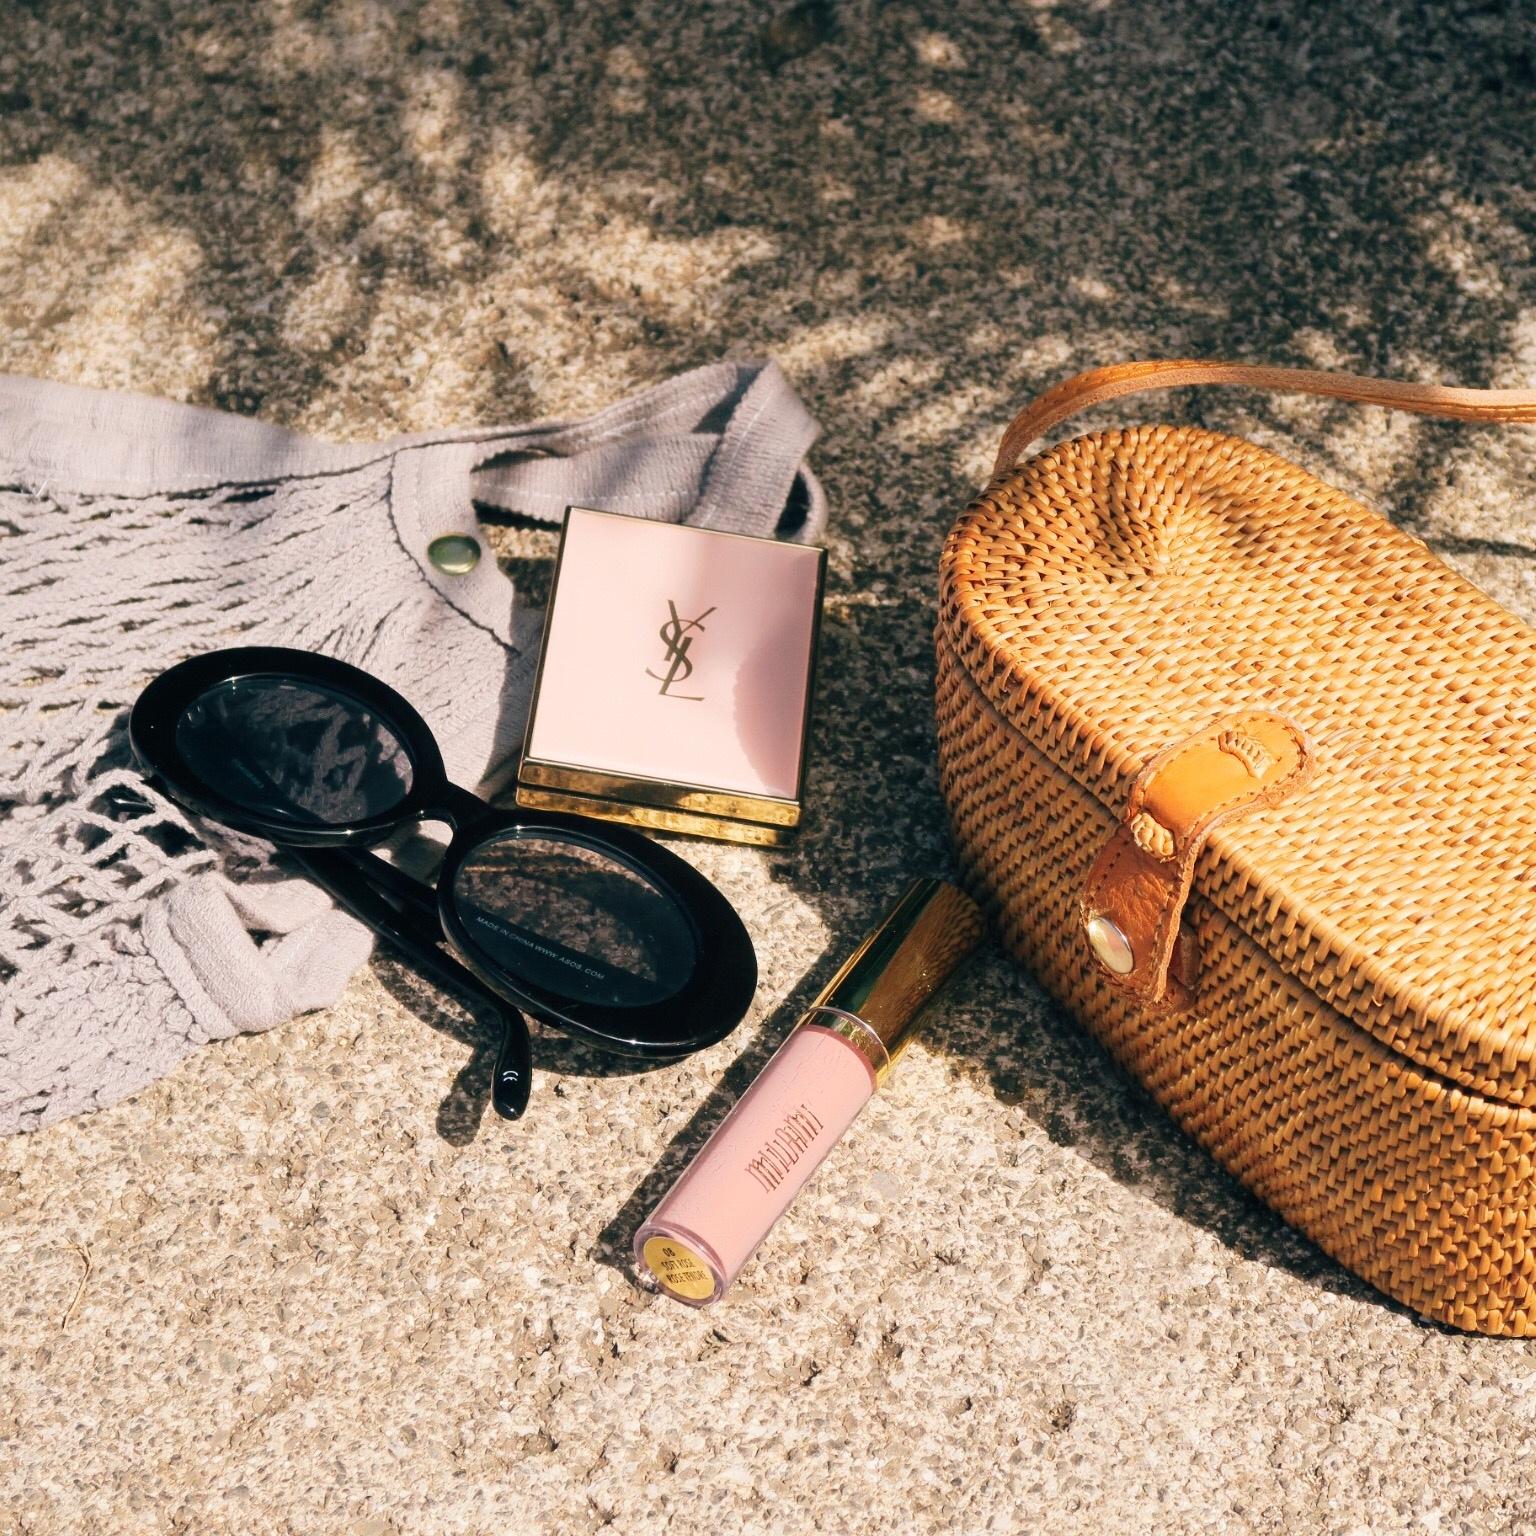 Island essentials – Clare V Netty bag ,  Asos Oval Sunglasses ,  YSL Touche Eclat Blur Perfector ,  Milani Lip Plumper in Soft Rose ,  Faithfull the Brand Camila Bag